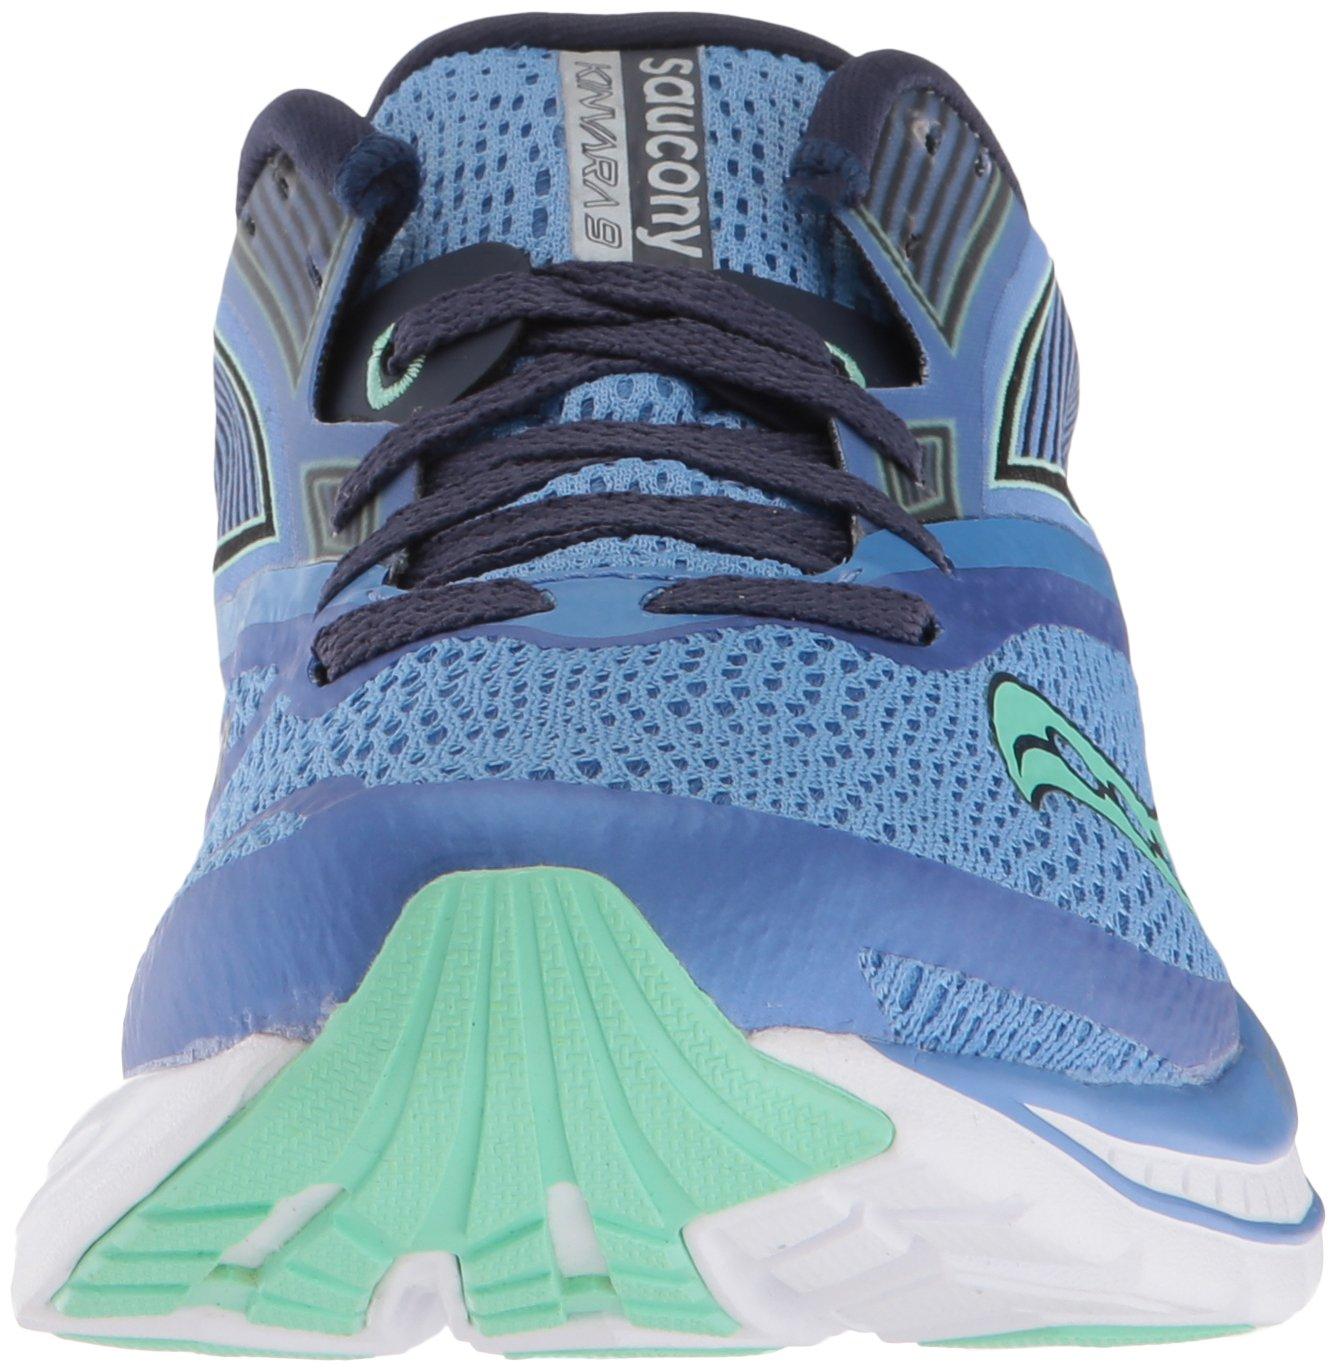 Saucony Women's Kinvara 9 Running Shoe, Blue/Teal, 9.5 Medium US by Saucony (Image #4)